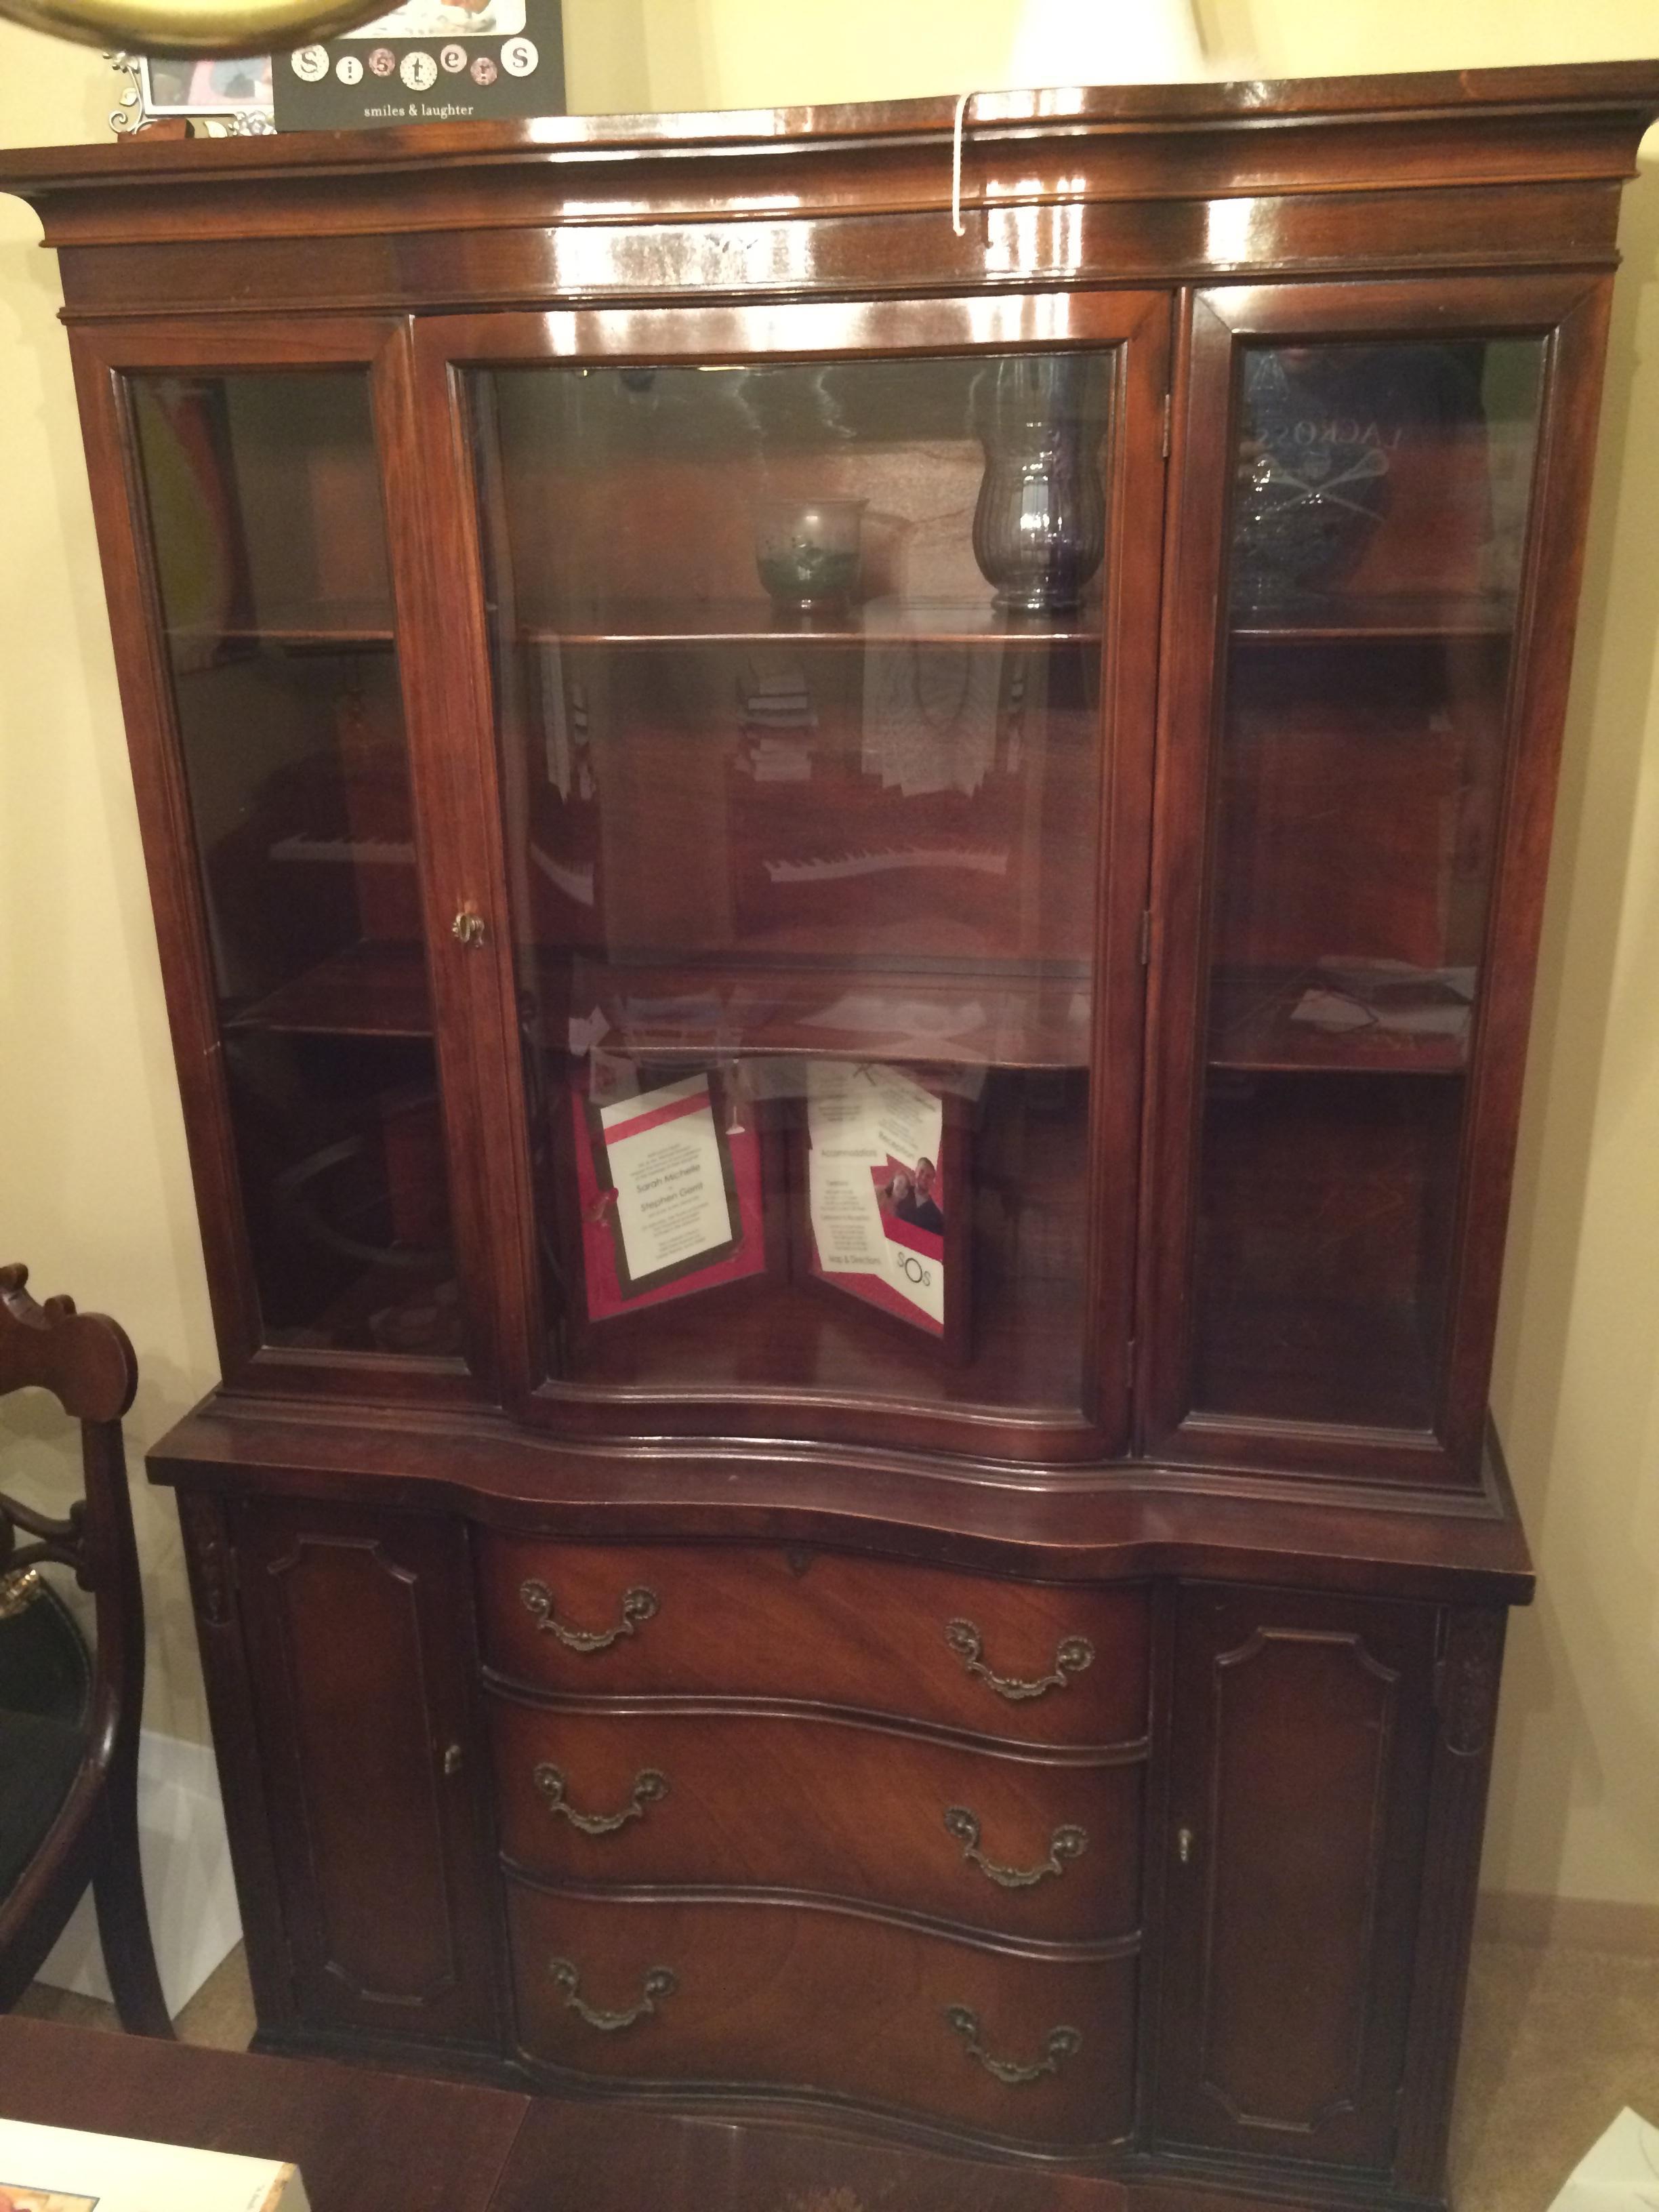 antique dining room hutch antique appraisal instappraisal. Black Bedroom Furniture Sets. Home Design Ideas